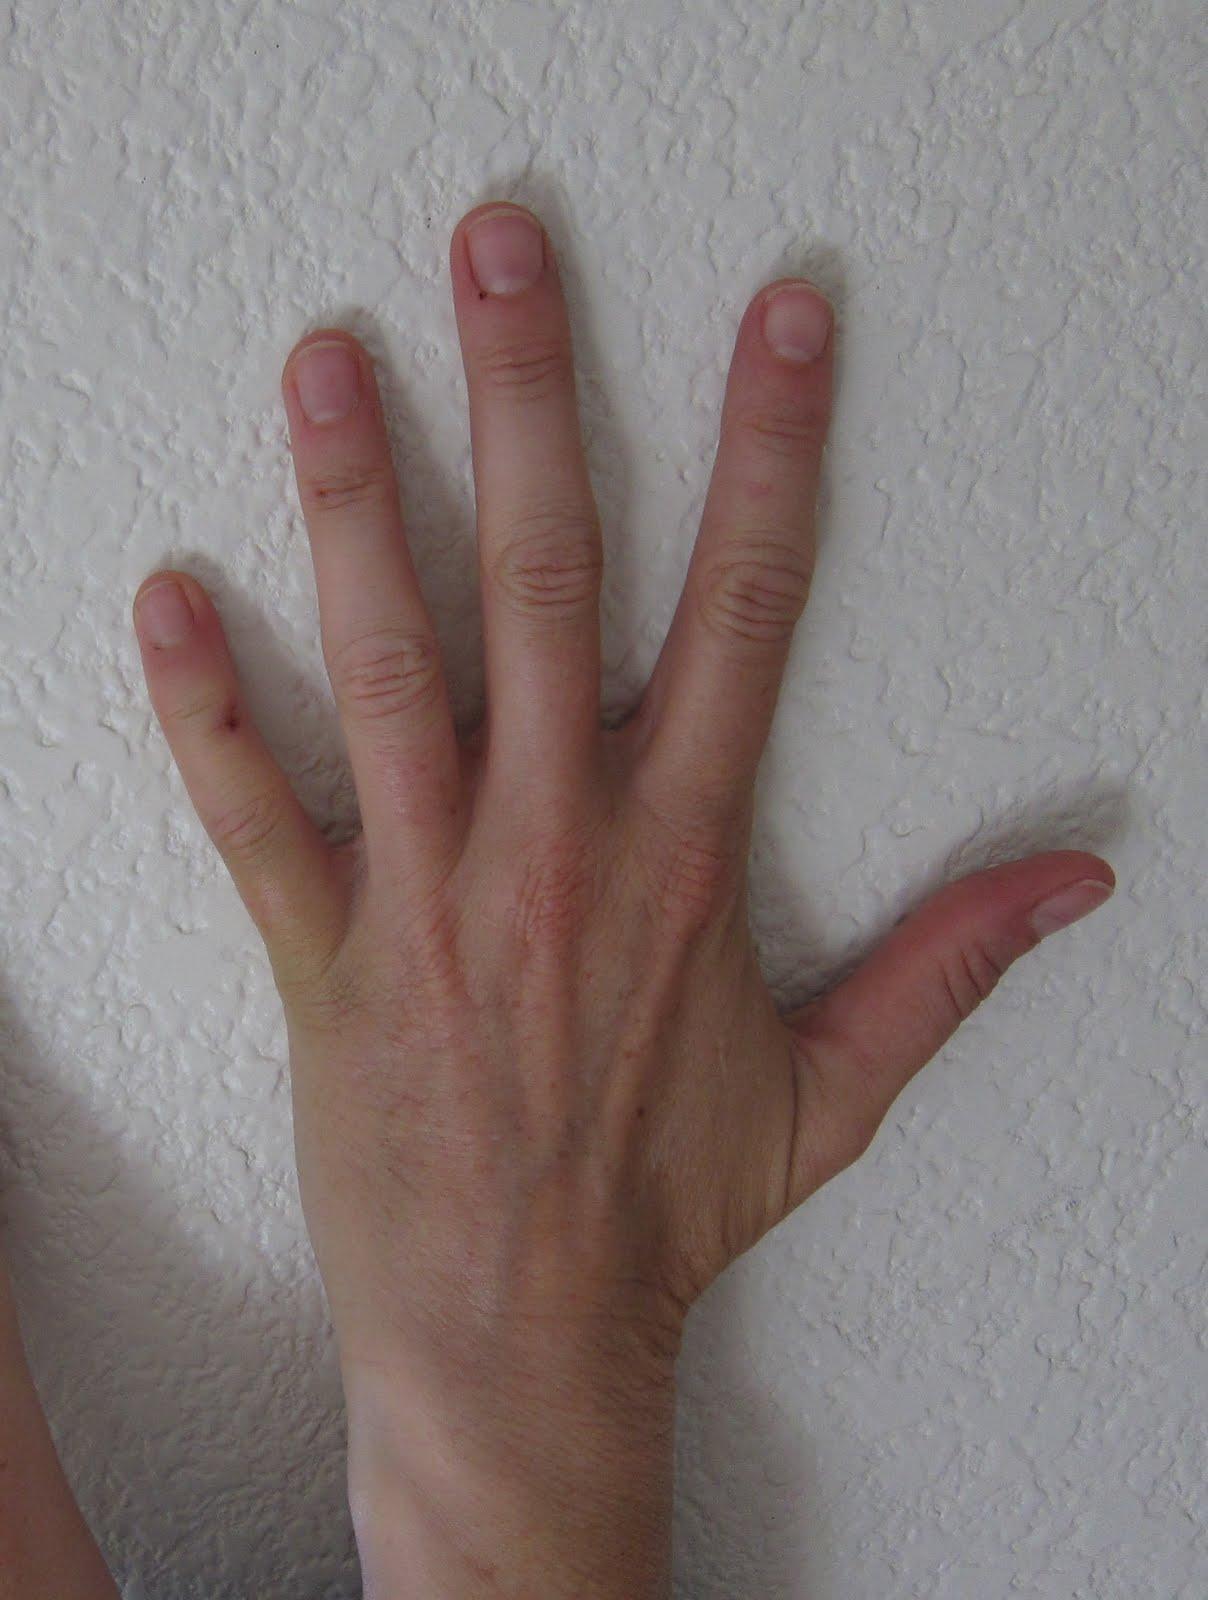 Treating Smashed Fingers  DrGreenecom